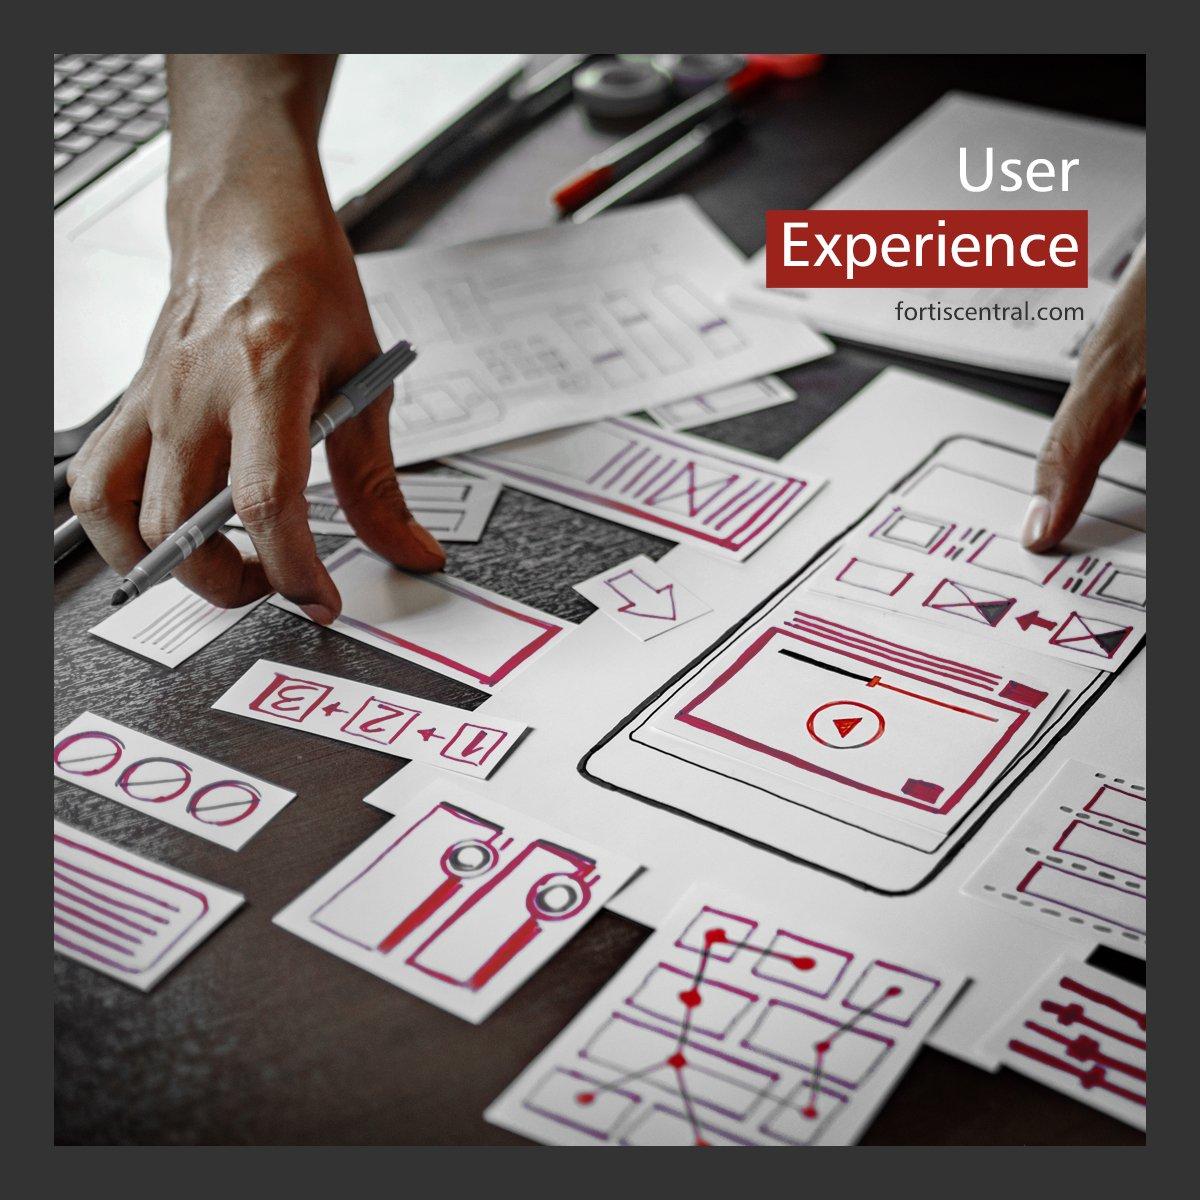 Salah satu aspek yang sangat penting dalam produk digital, entah itu website, aplikasi smartphone, maupun pada software komputer adalah User Experience. Apa itu user experience dan kenapa memiliki peranan yang sangat  penting?  #ux #uxdesign #design #userexperience